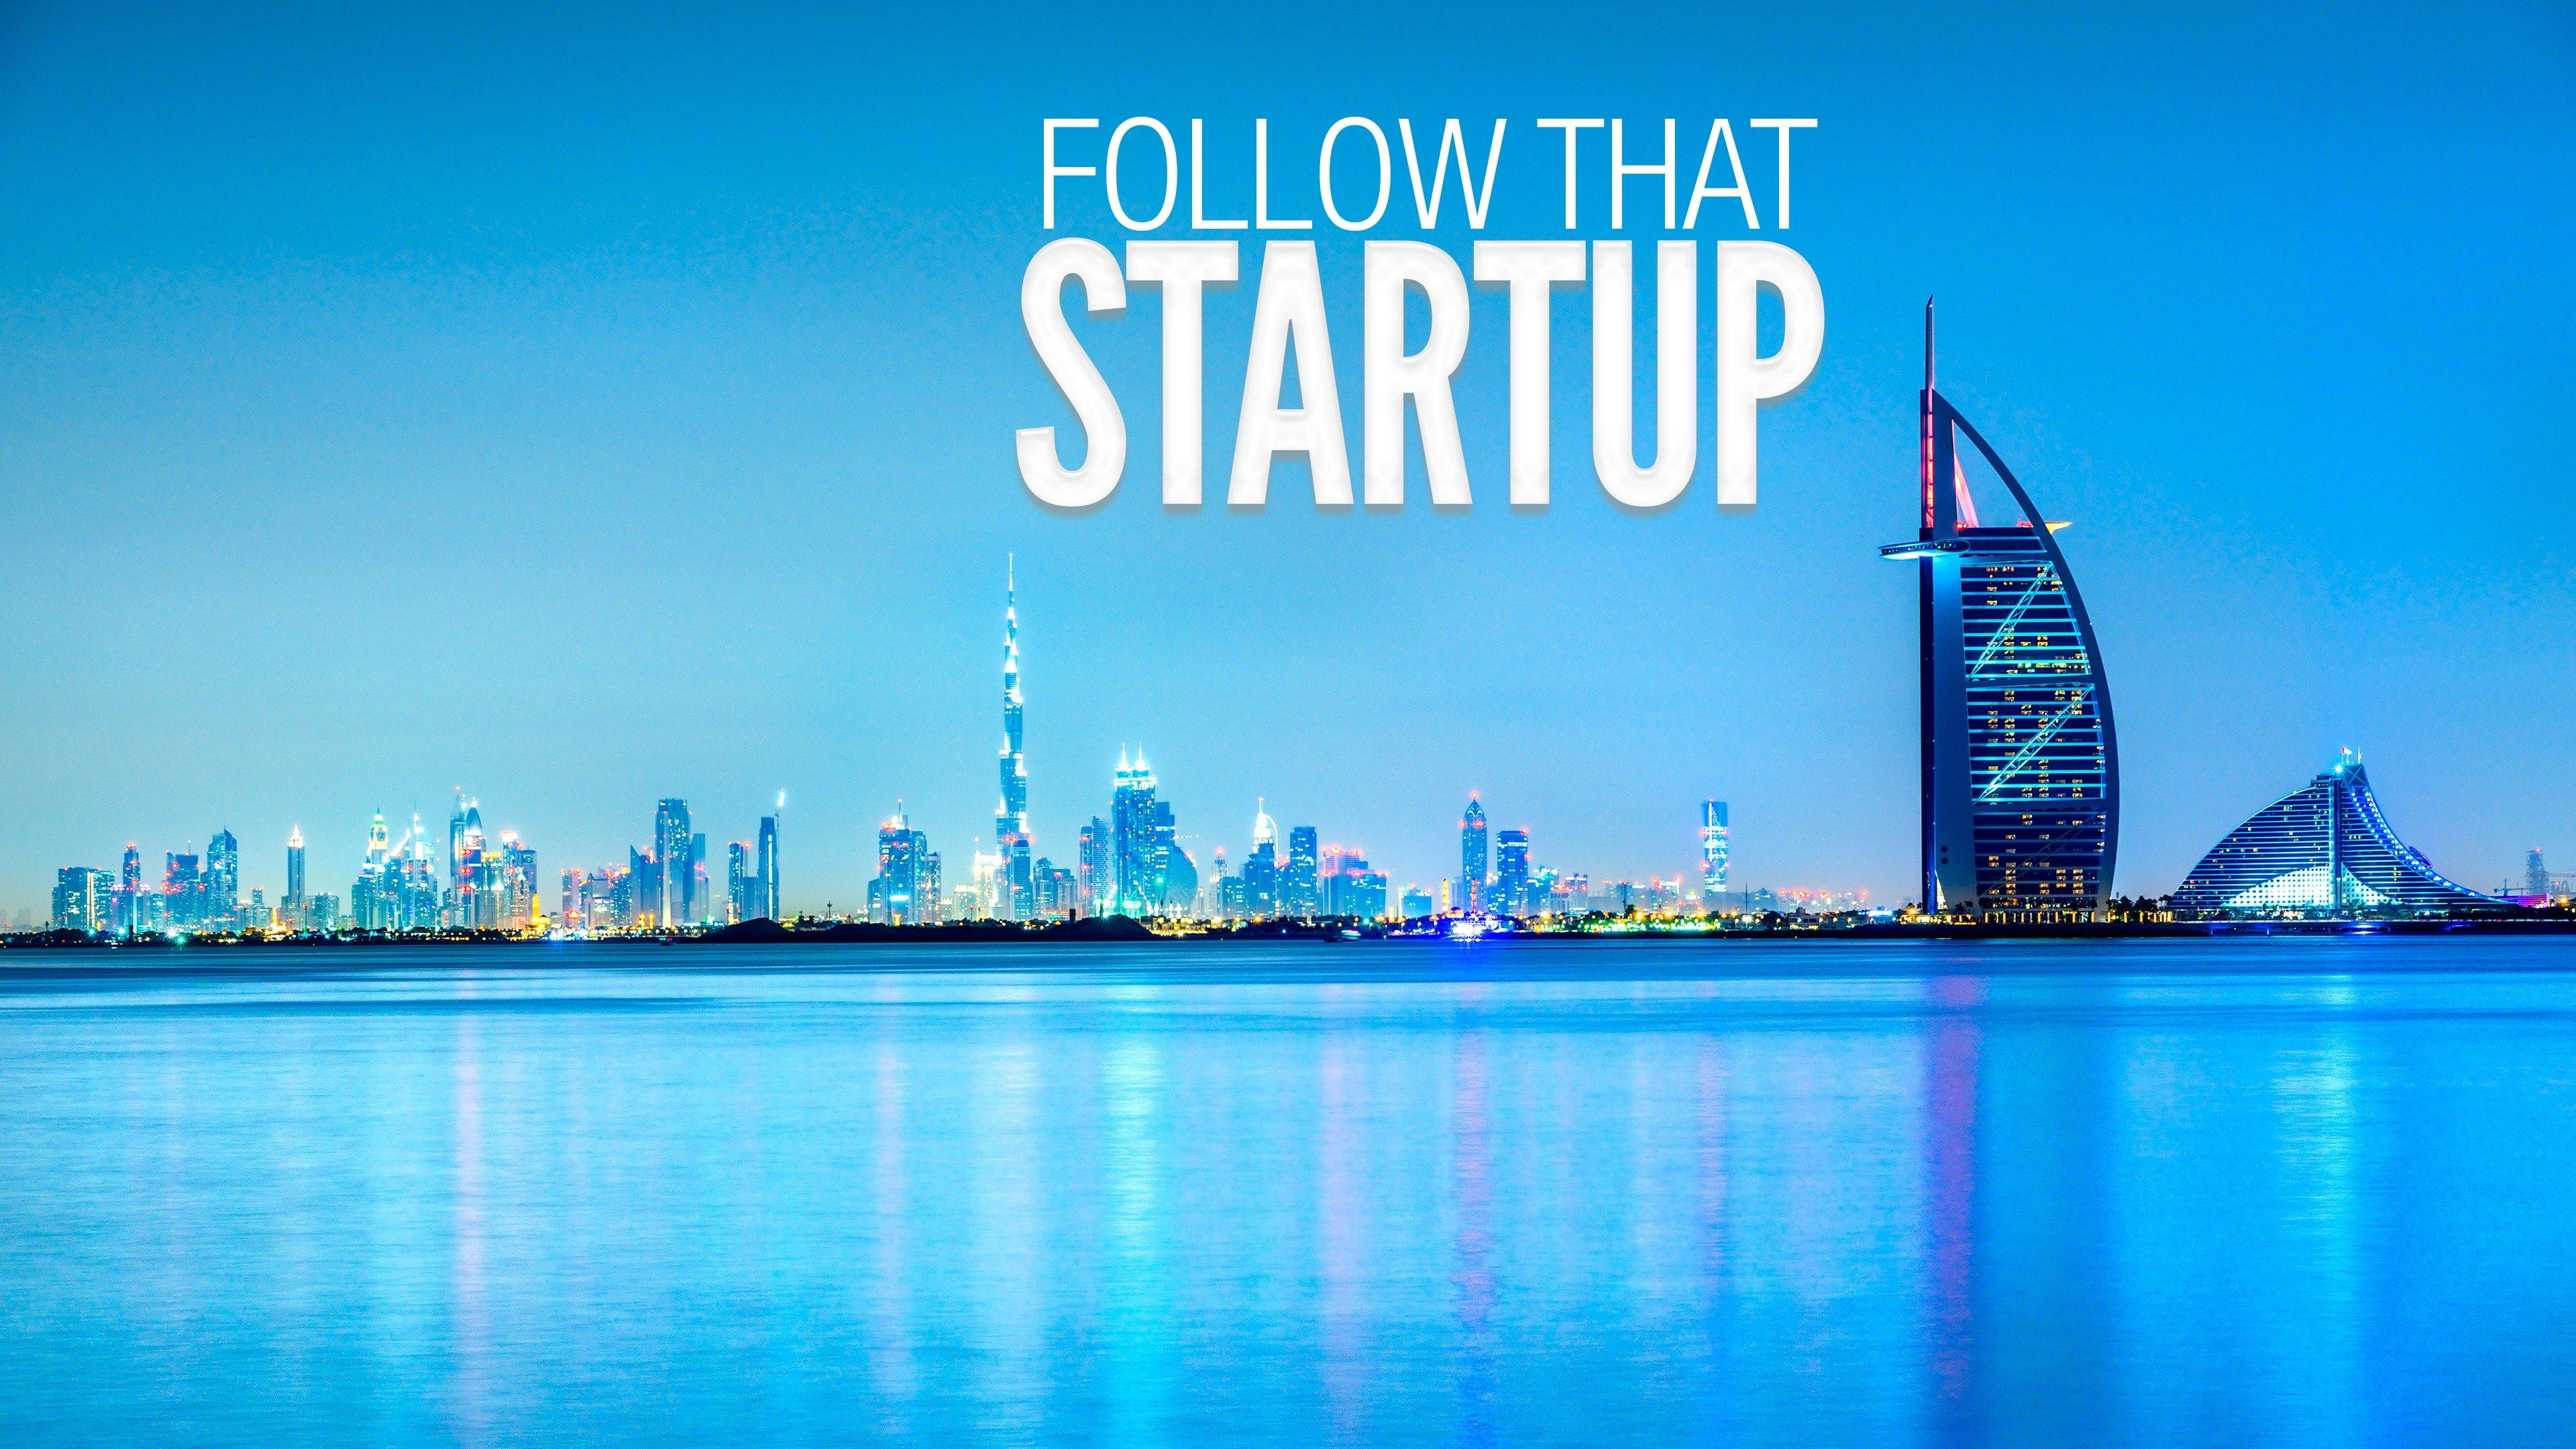 Follow That Startup